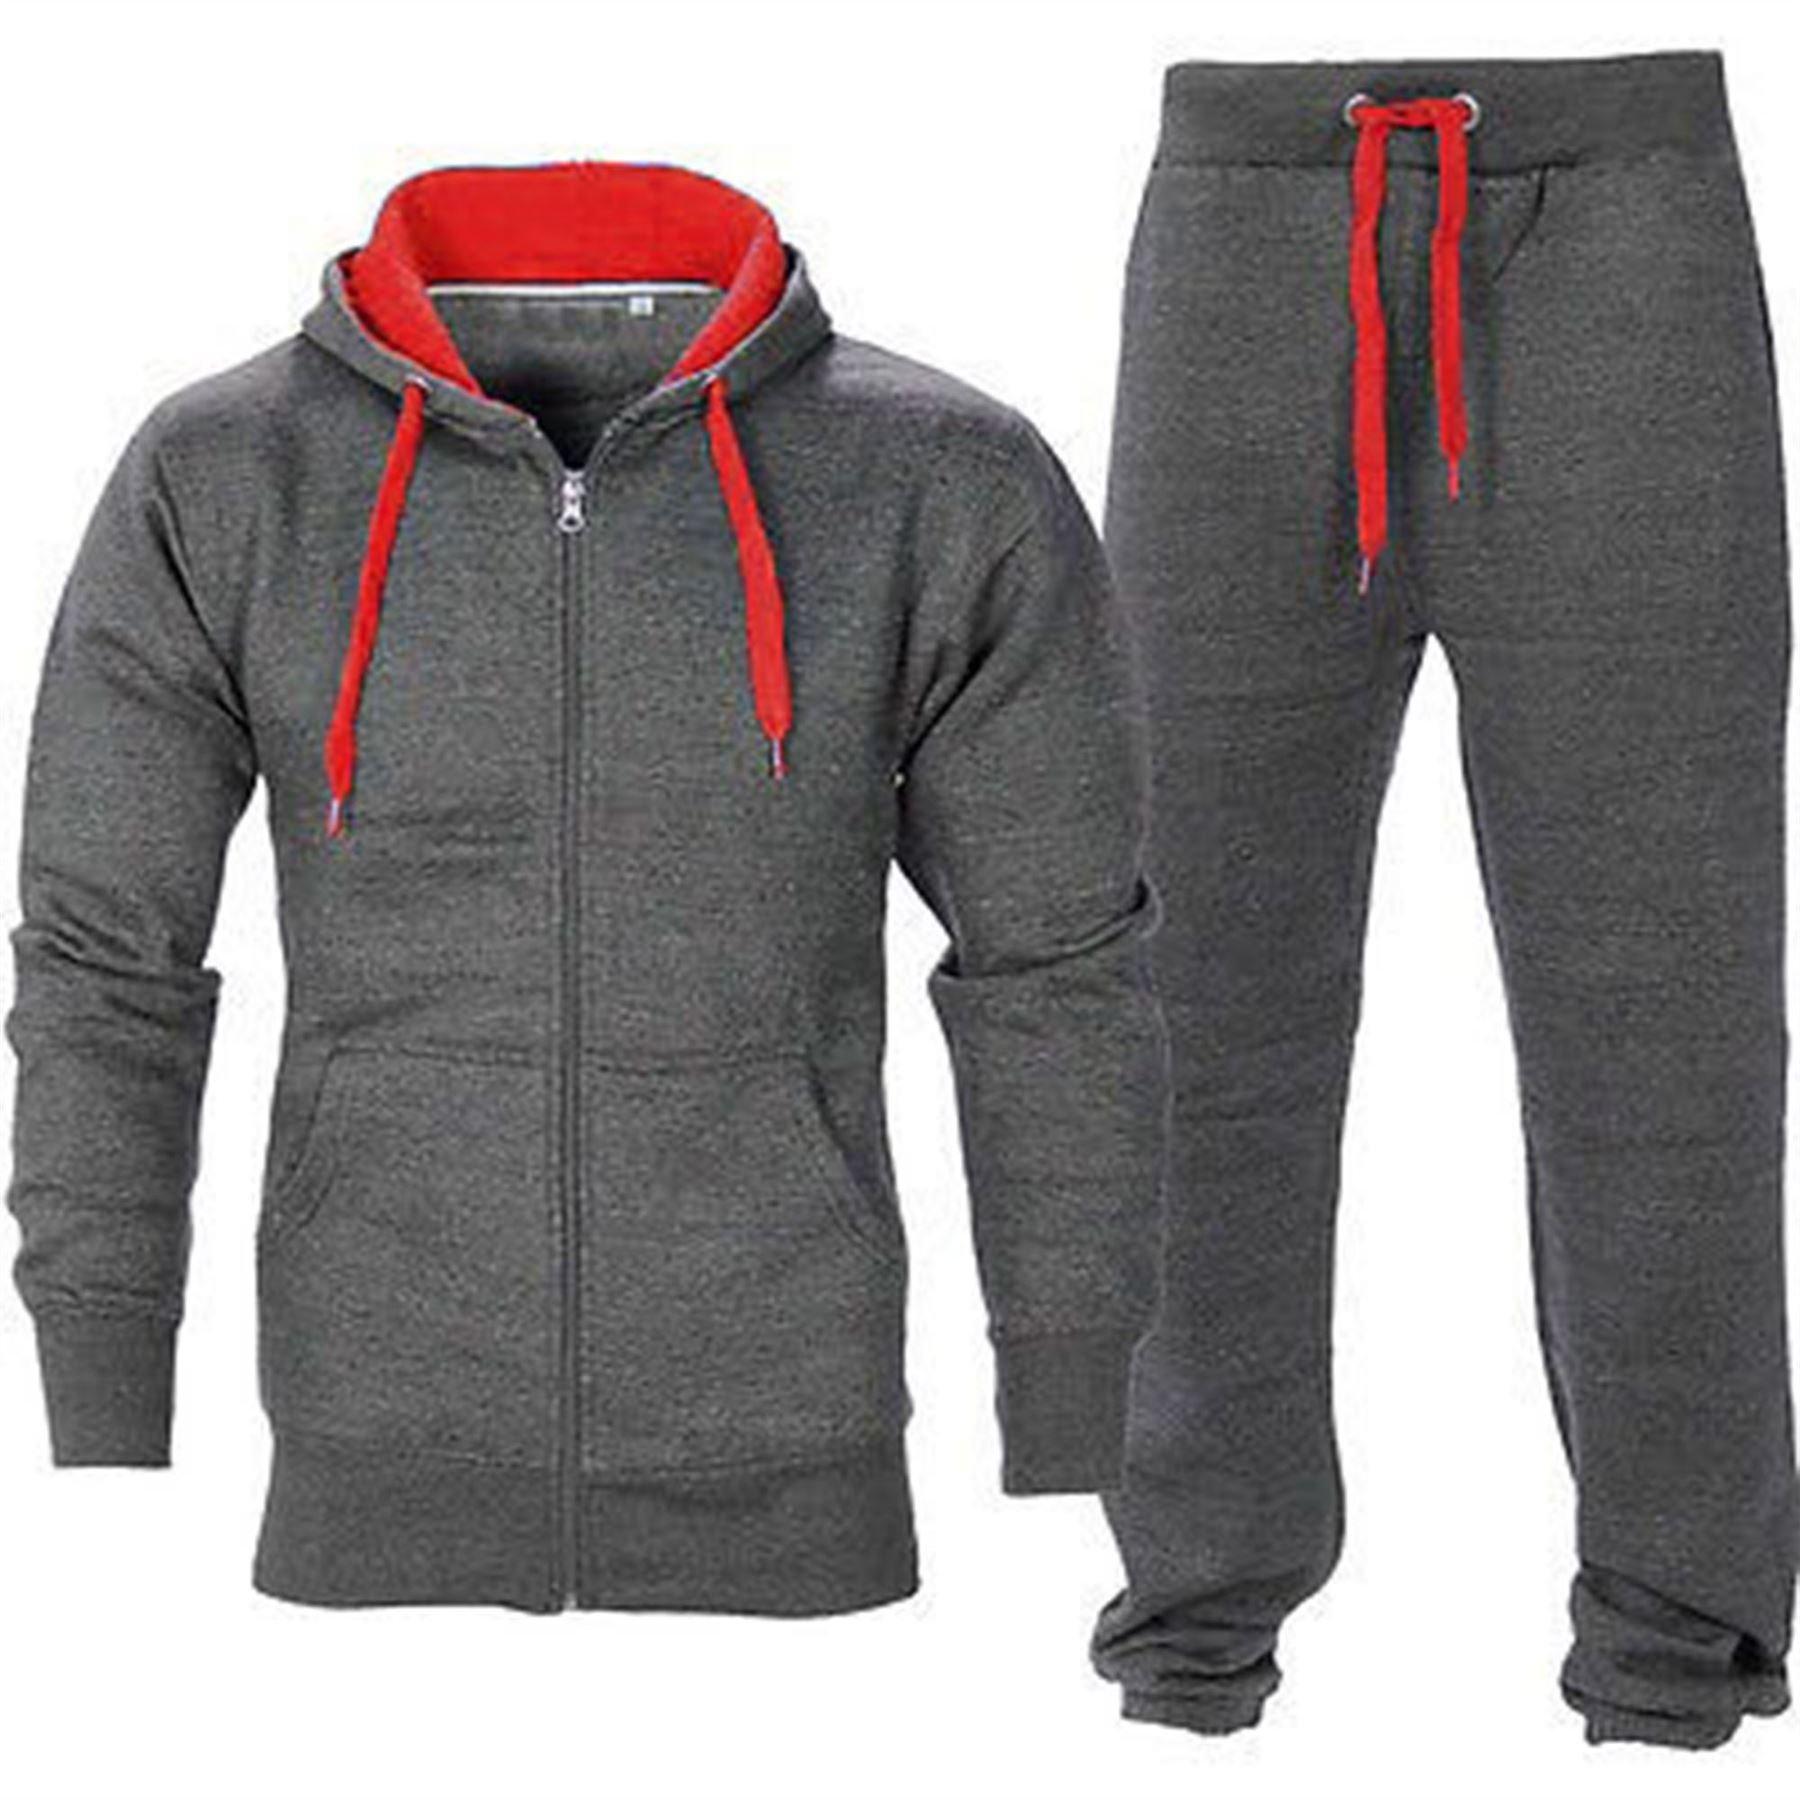 Men Tracksuit Set Fleece Hoodie Bottom Jogger Kids Contrast Cord Gym Active wear